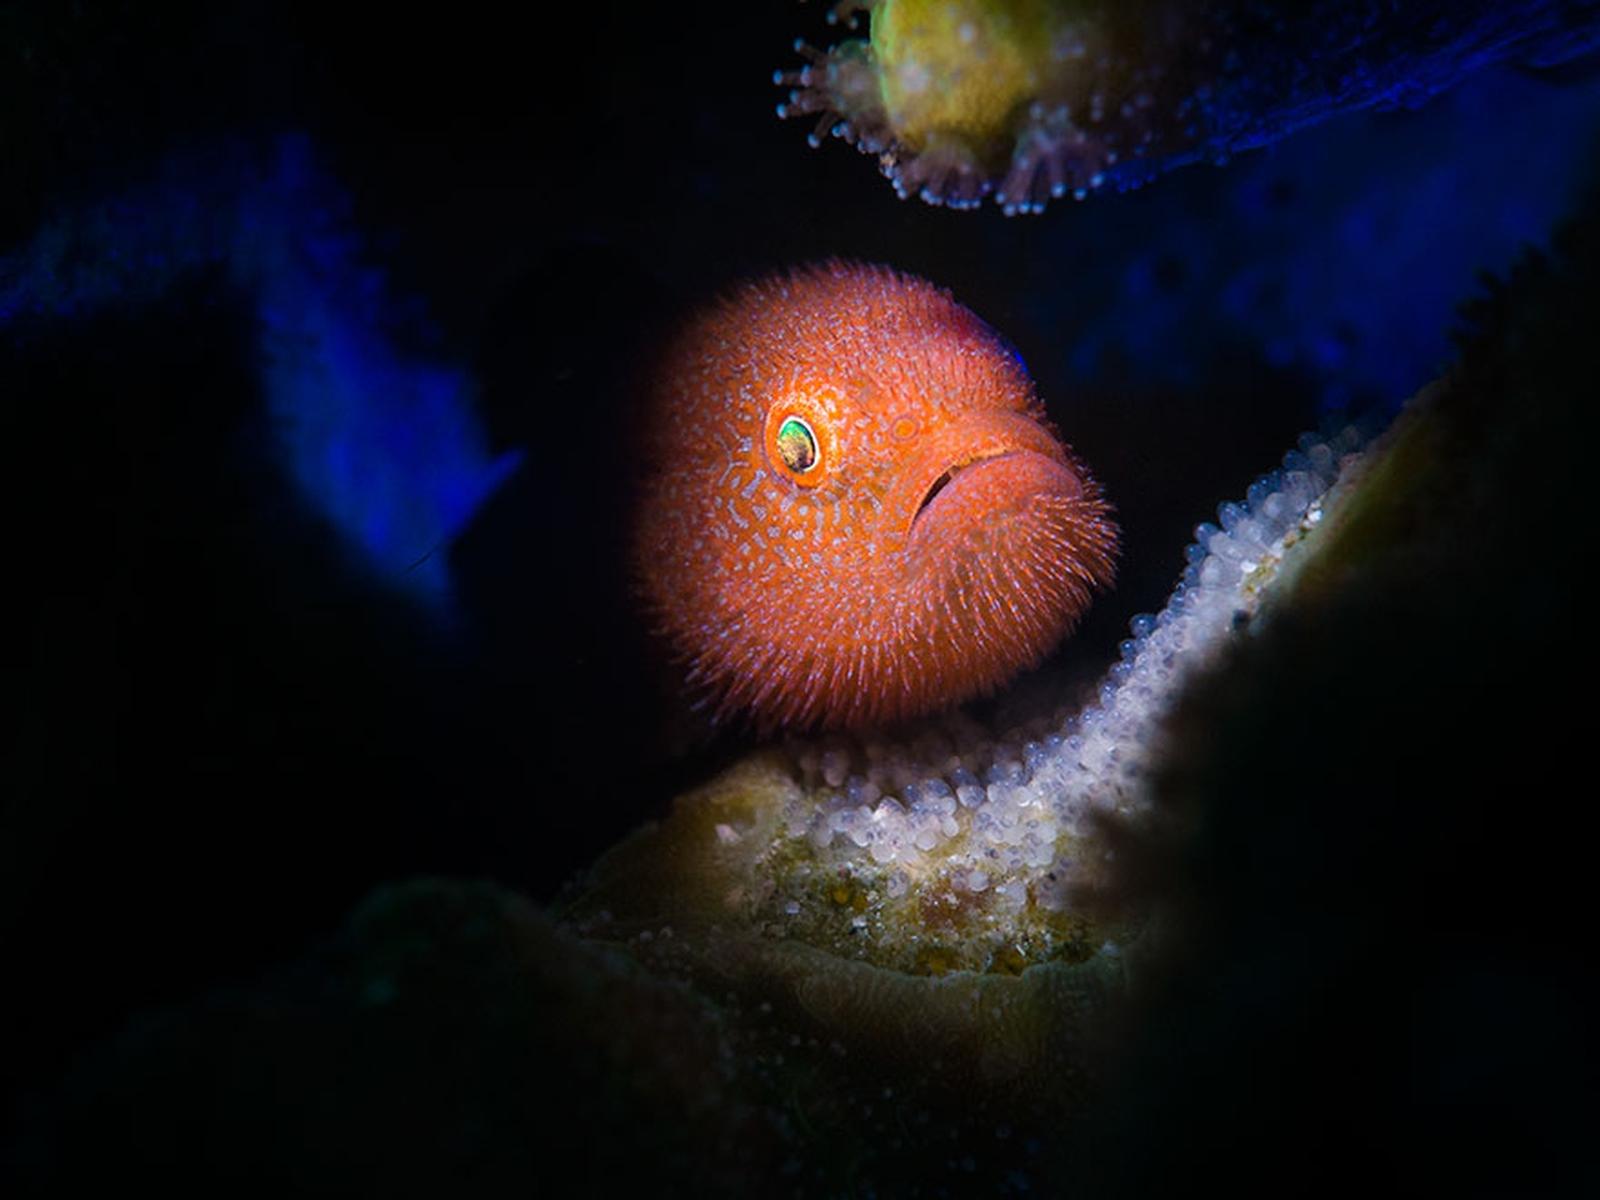 ocean-art-contest-winners_04